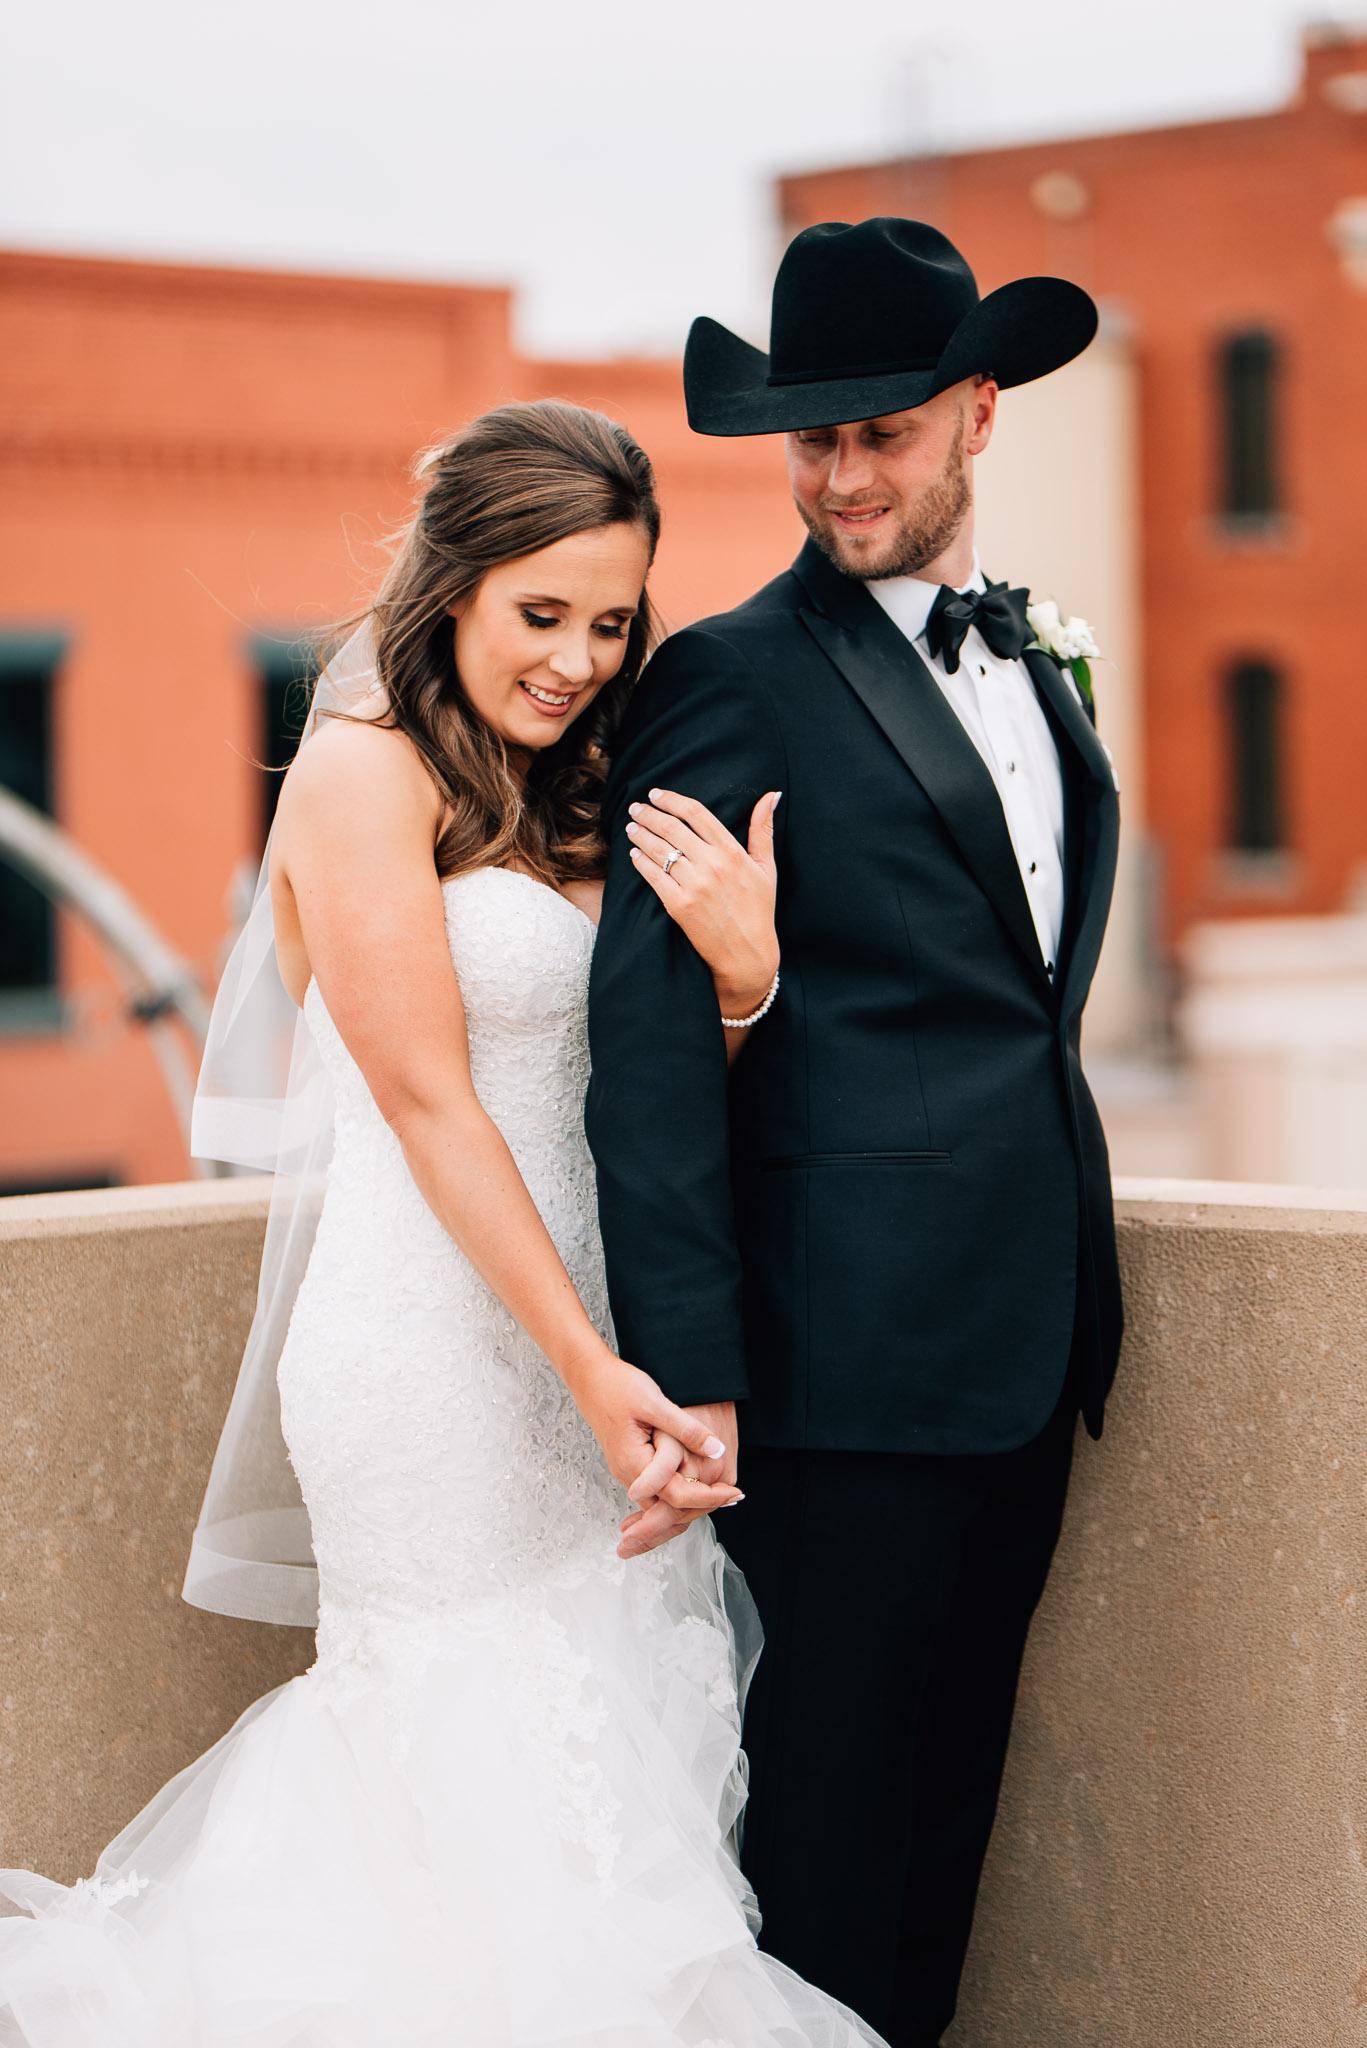 Cactus-Hotel-Wedding-San-Angelo-0019.jpg